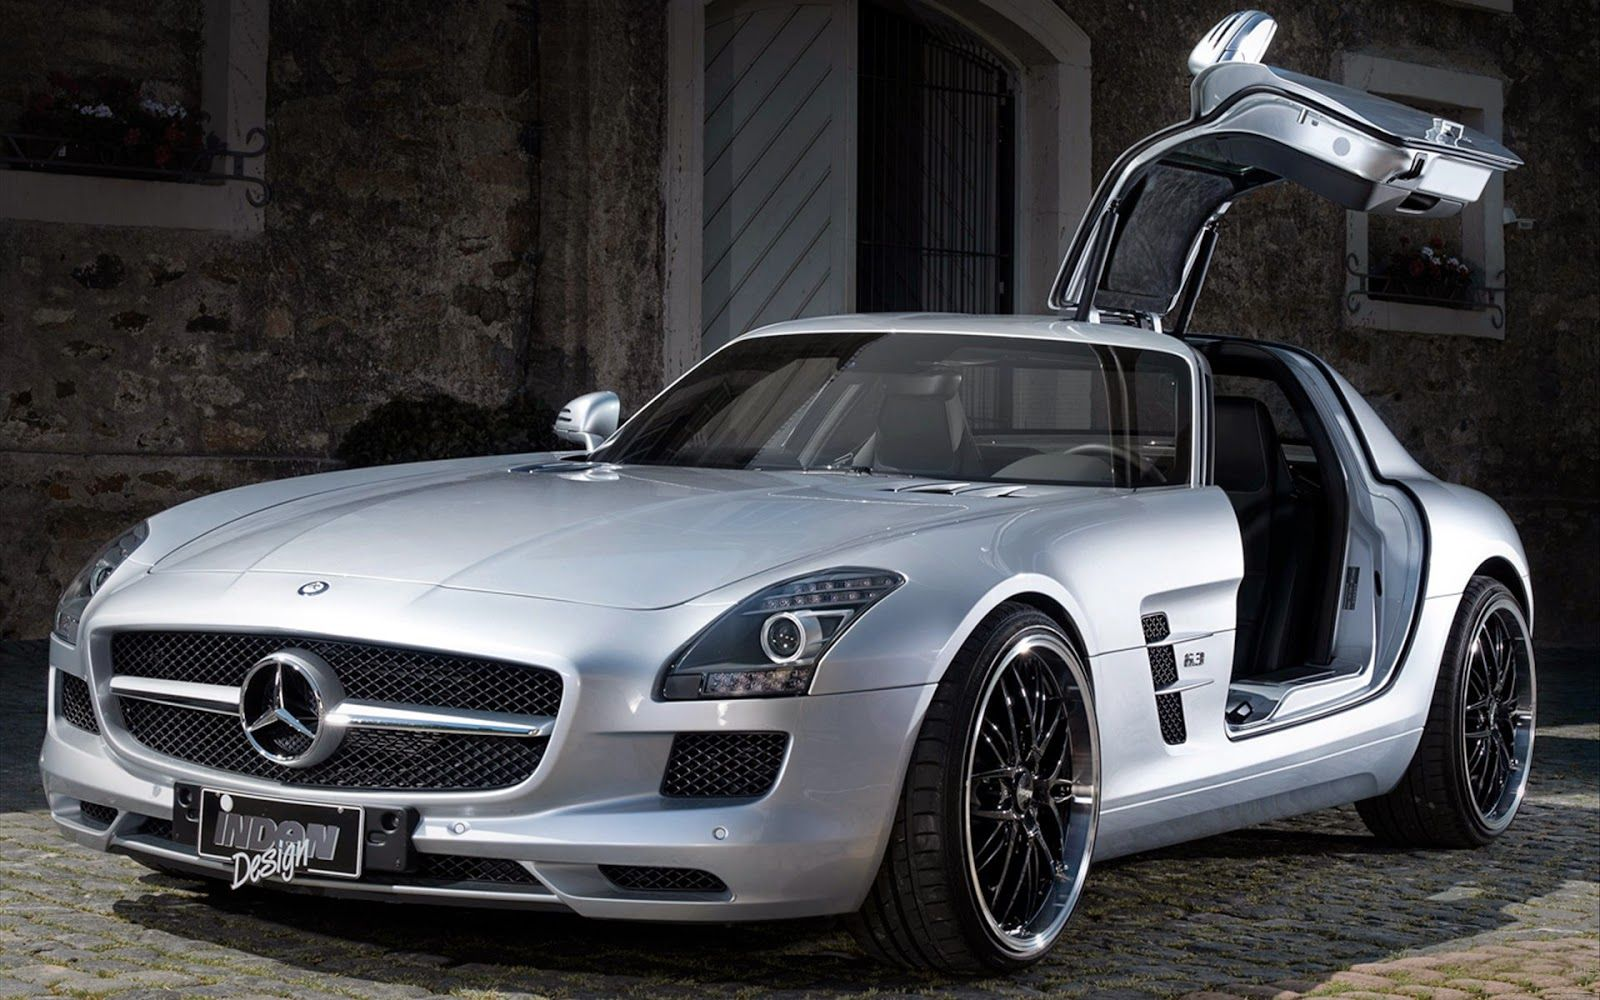 Mercedes SLS AMG Inden Design Best Wallpaper ~ Auto Cars | Auto Cars ...